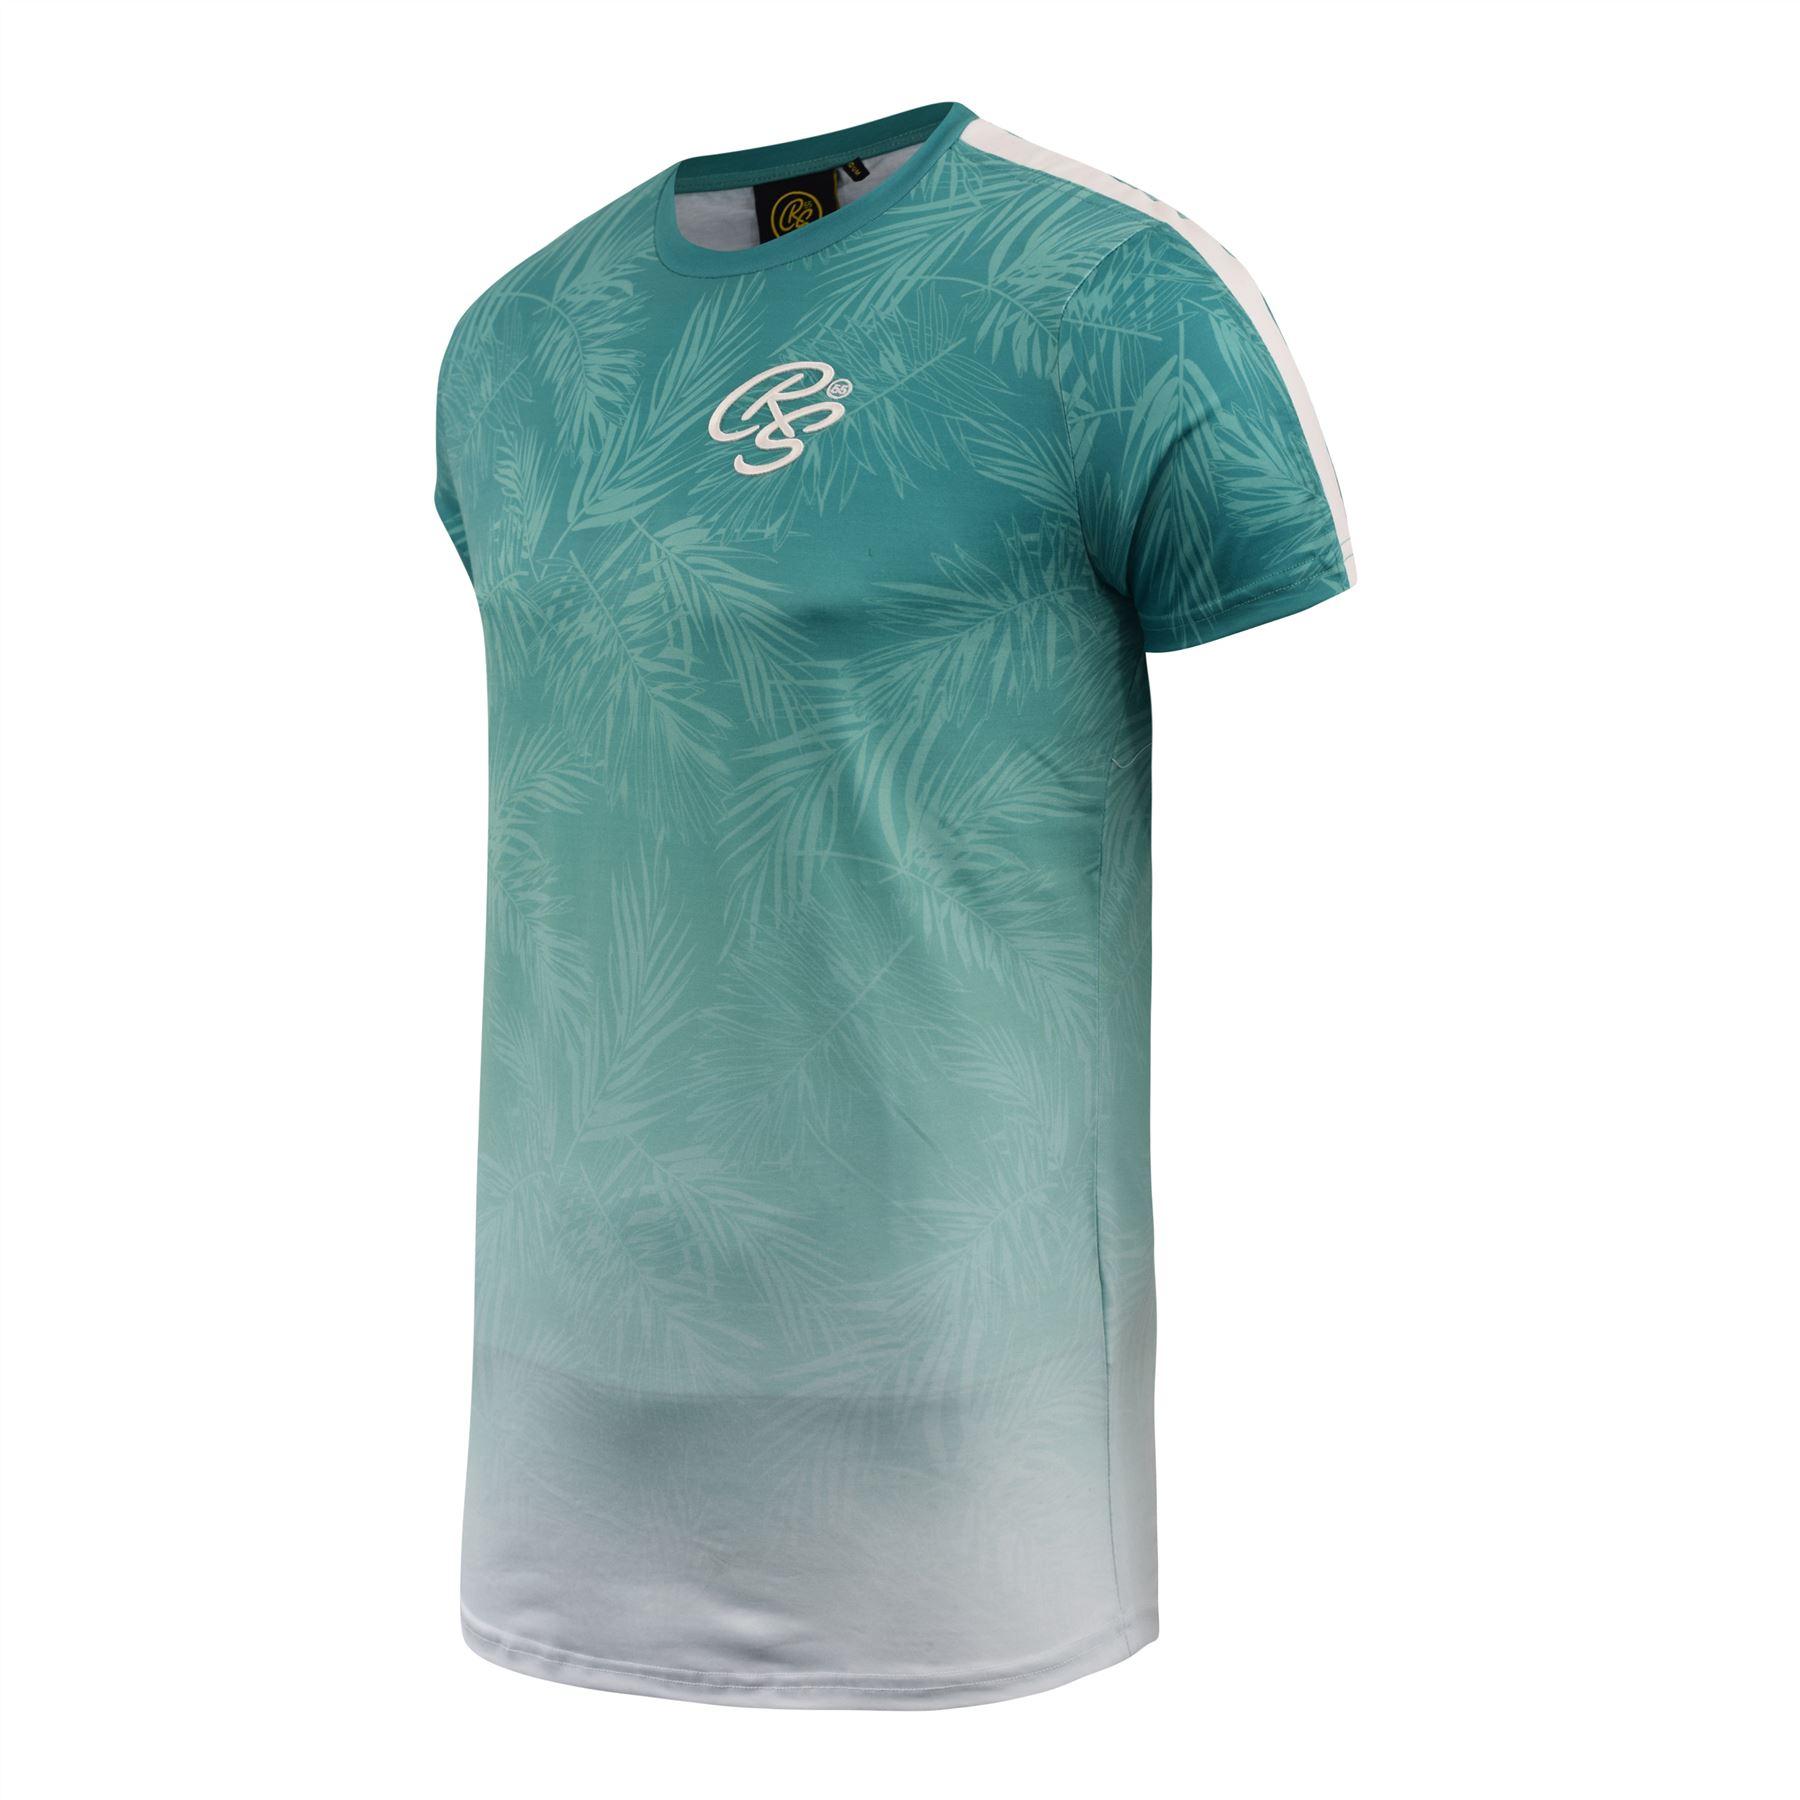 Mens-Crosshatch-T-Shirt-Contrast-Short-Sleeve-Tee-Top-Salifornia thumbnail 3